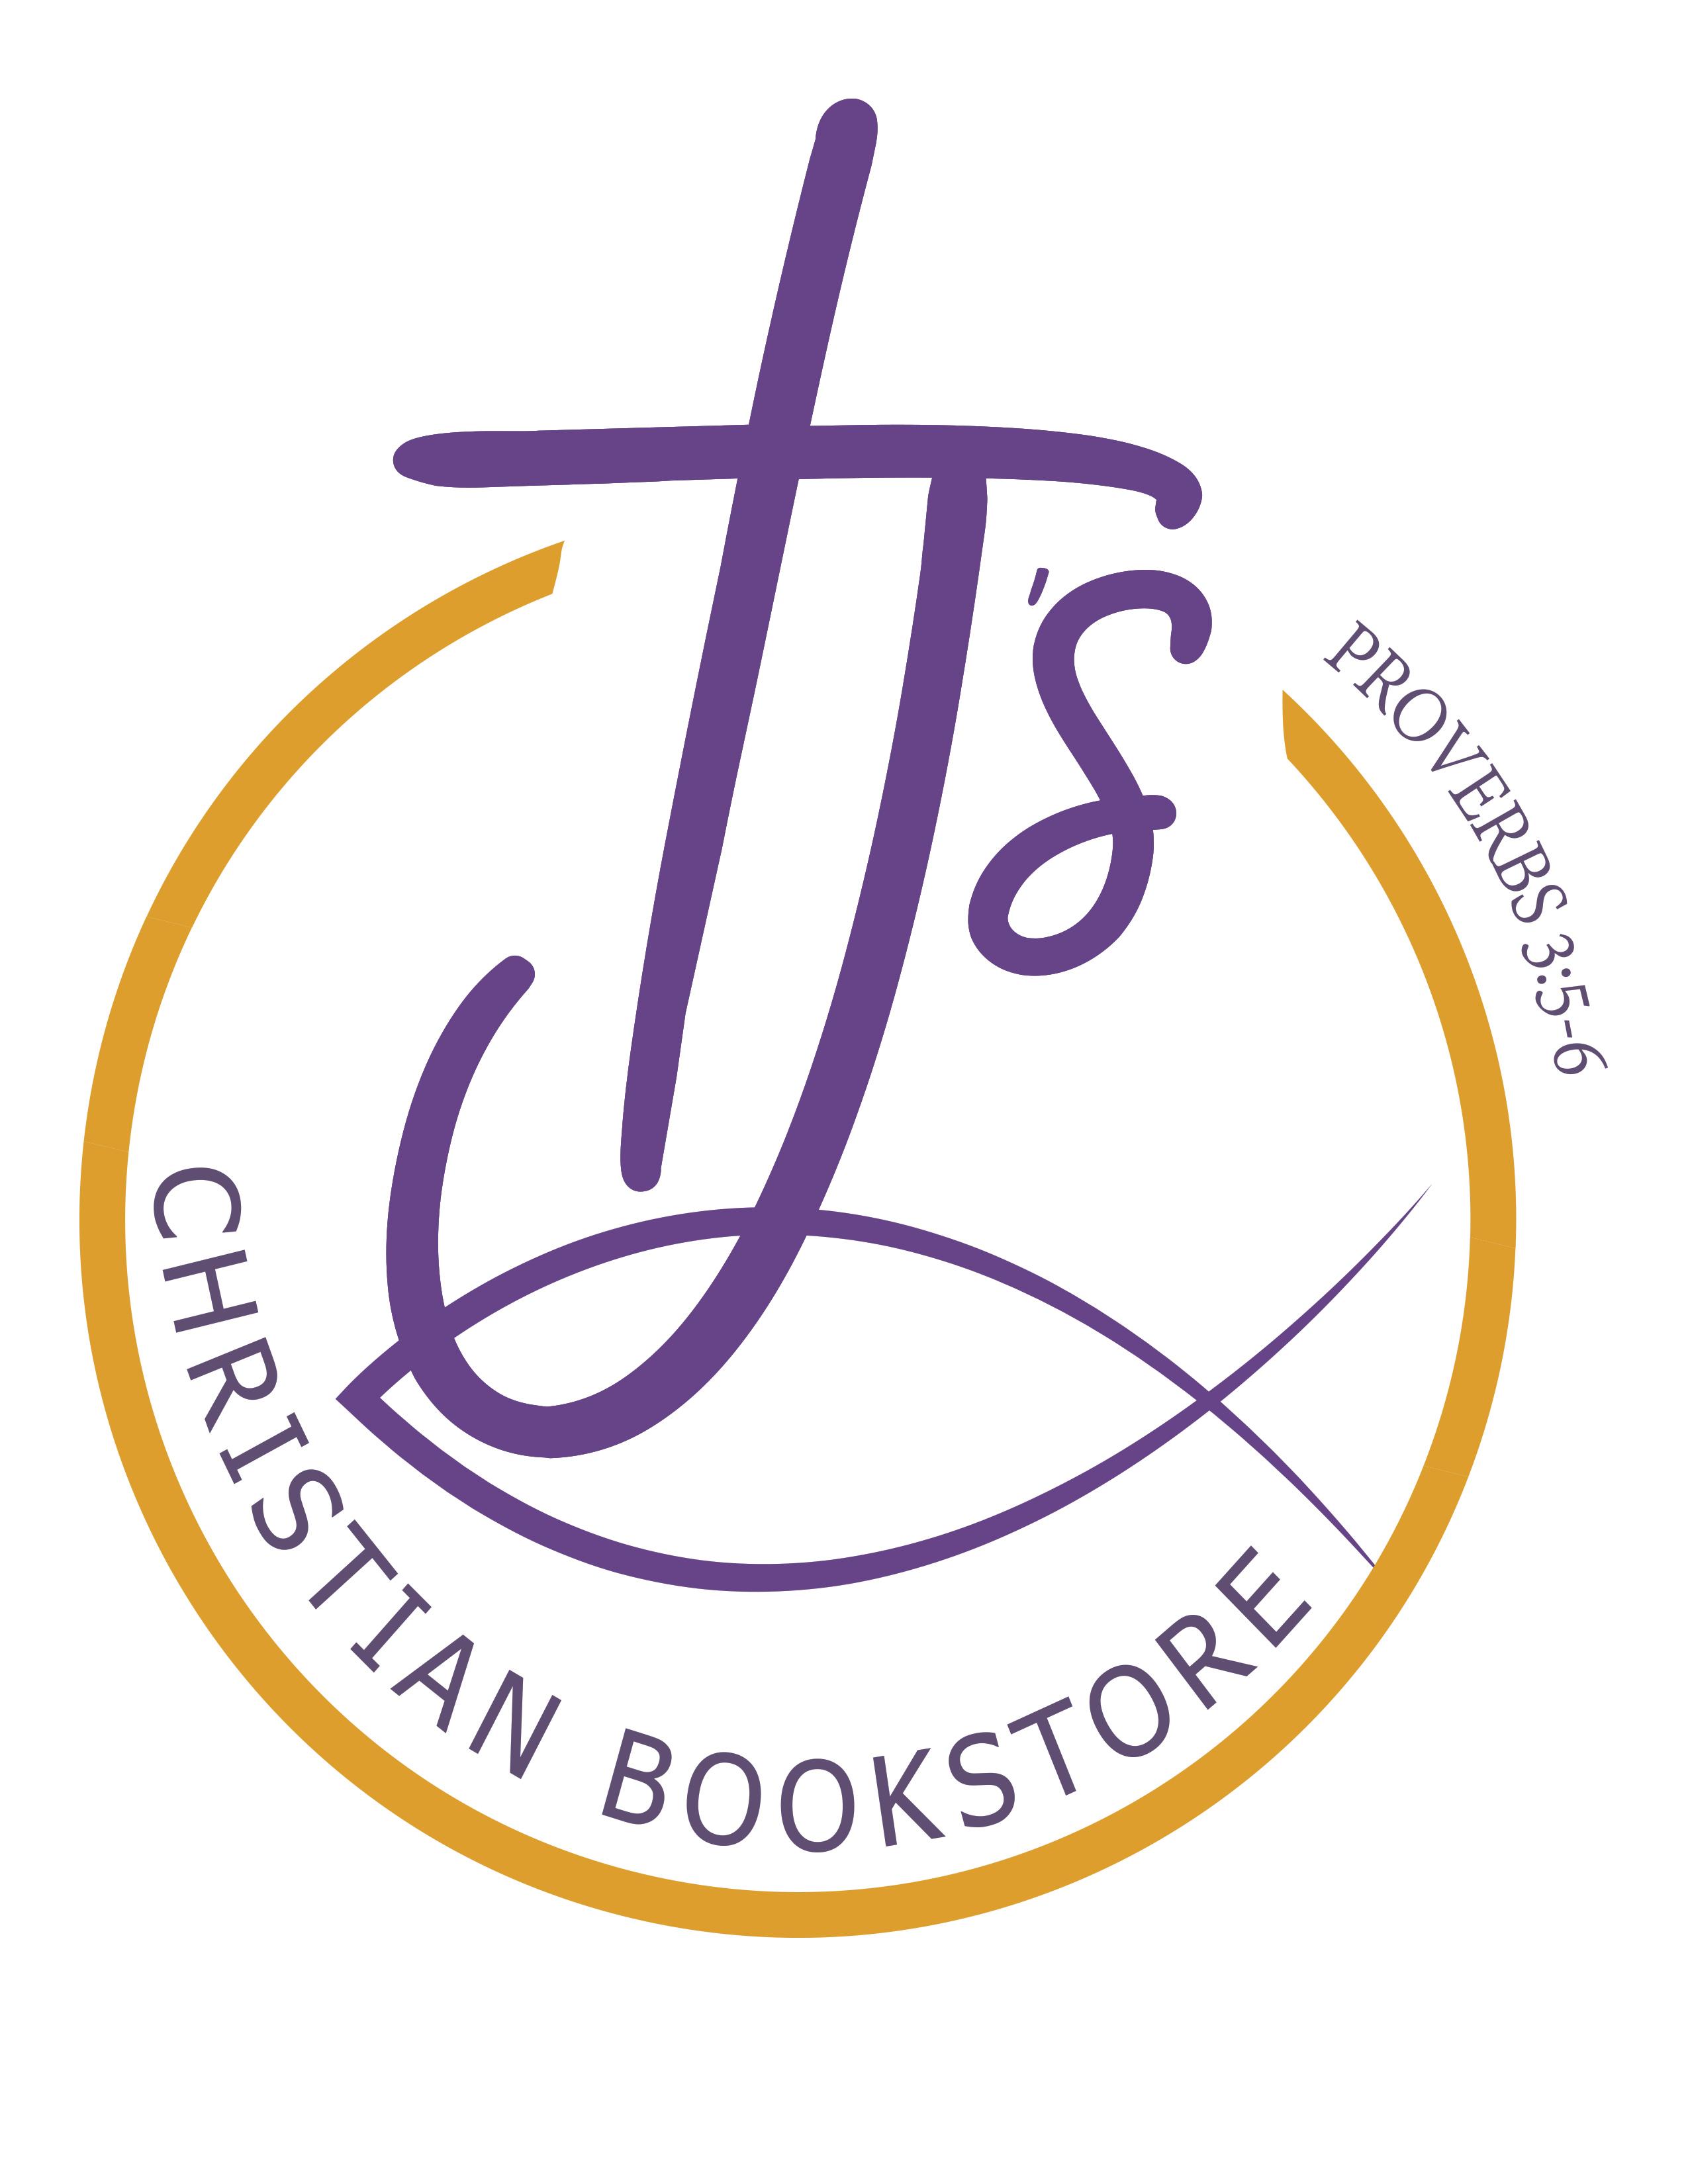 TJ's Christian Bookstore